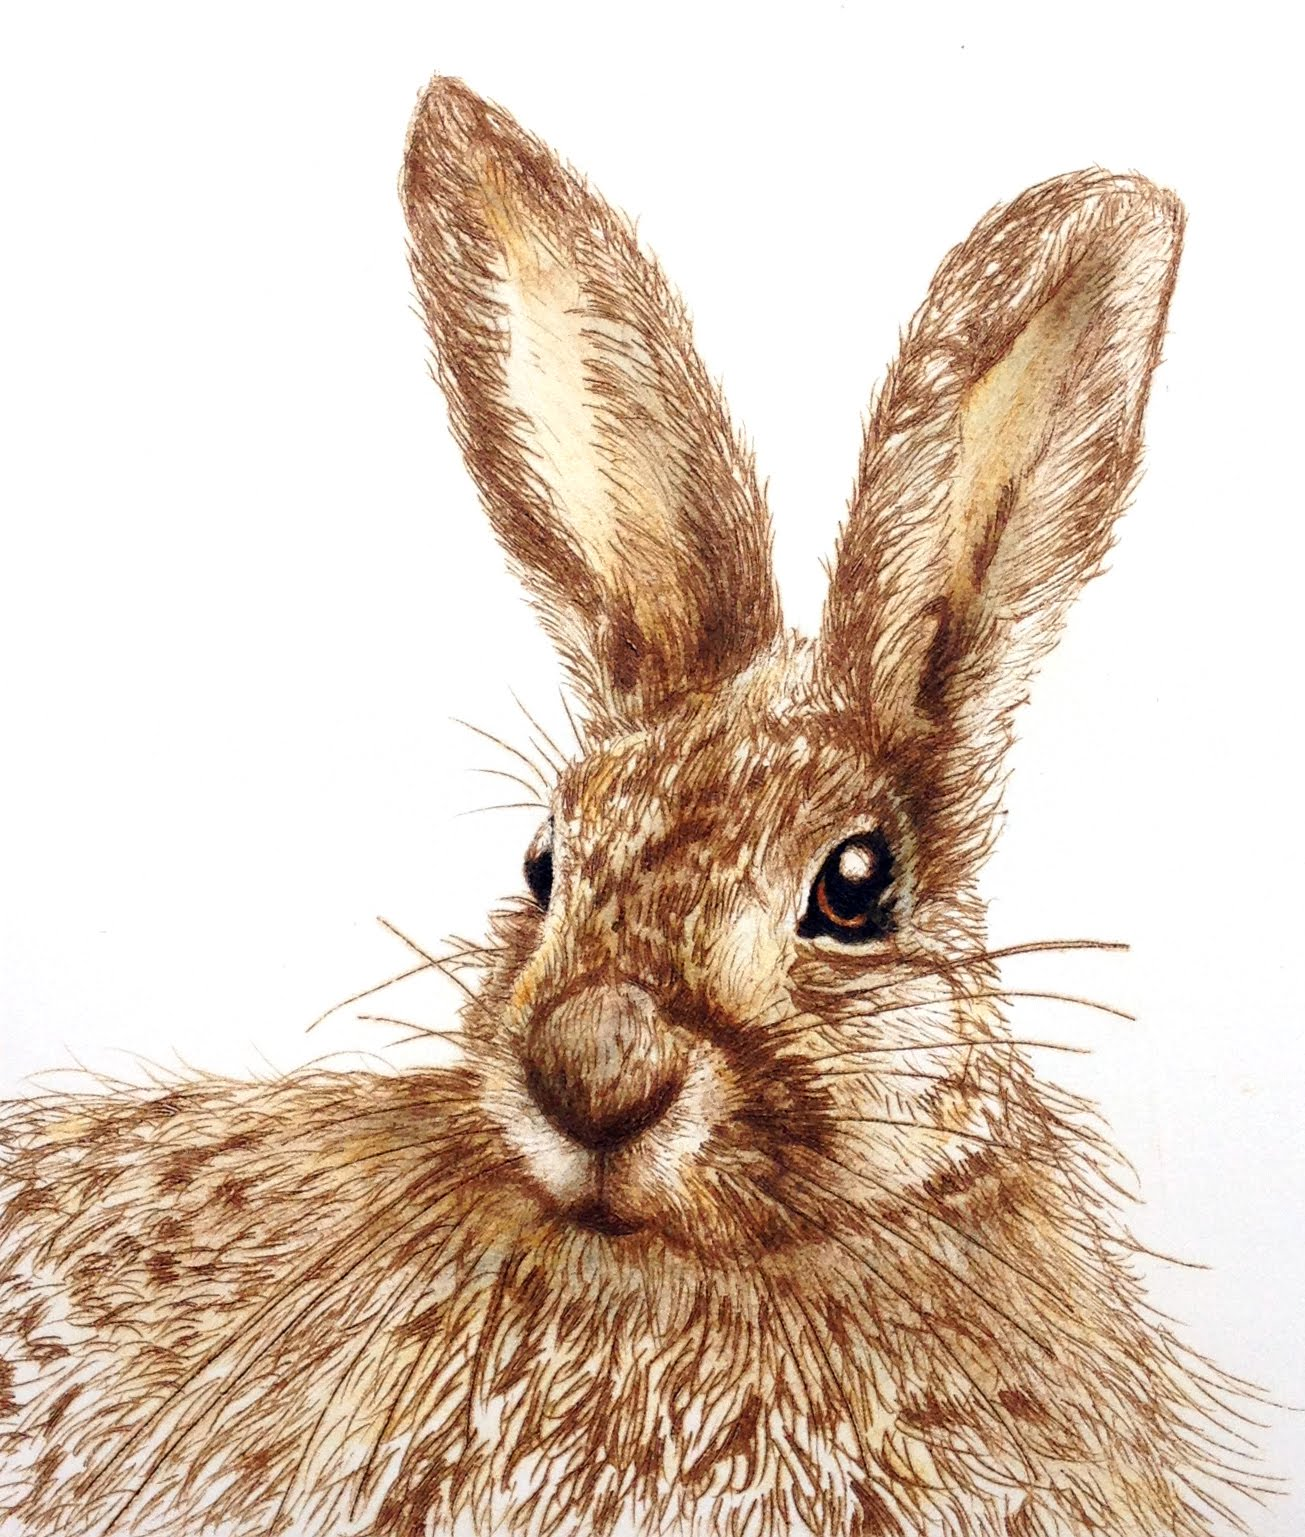 The Curios Hare.